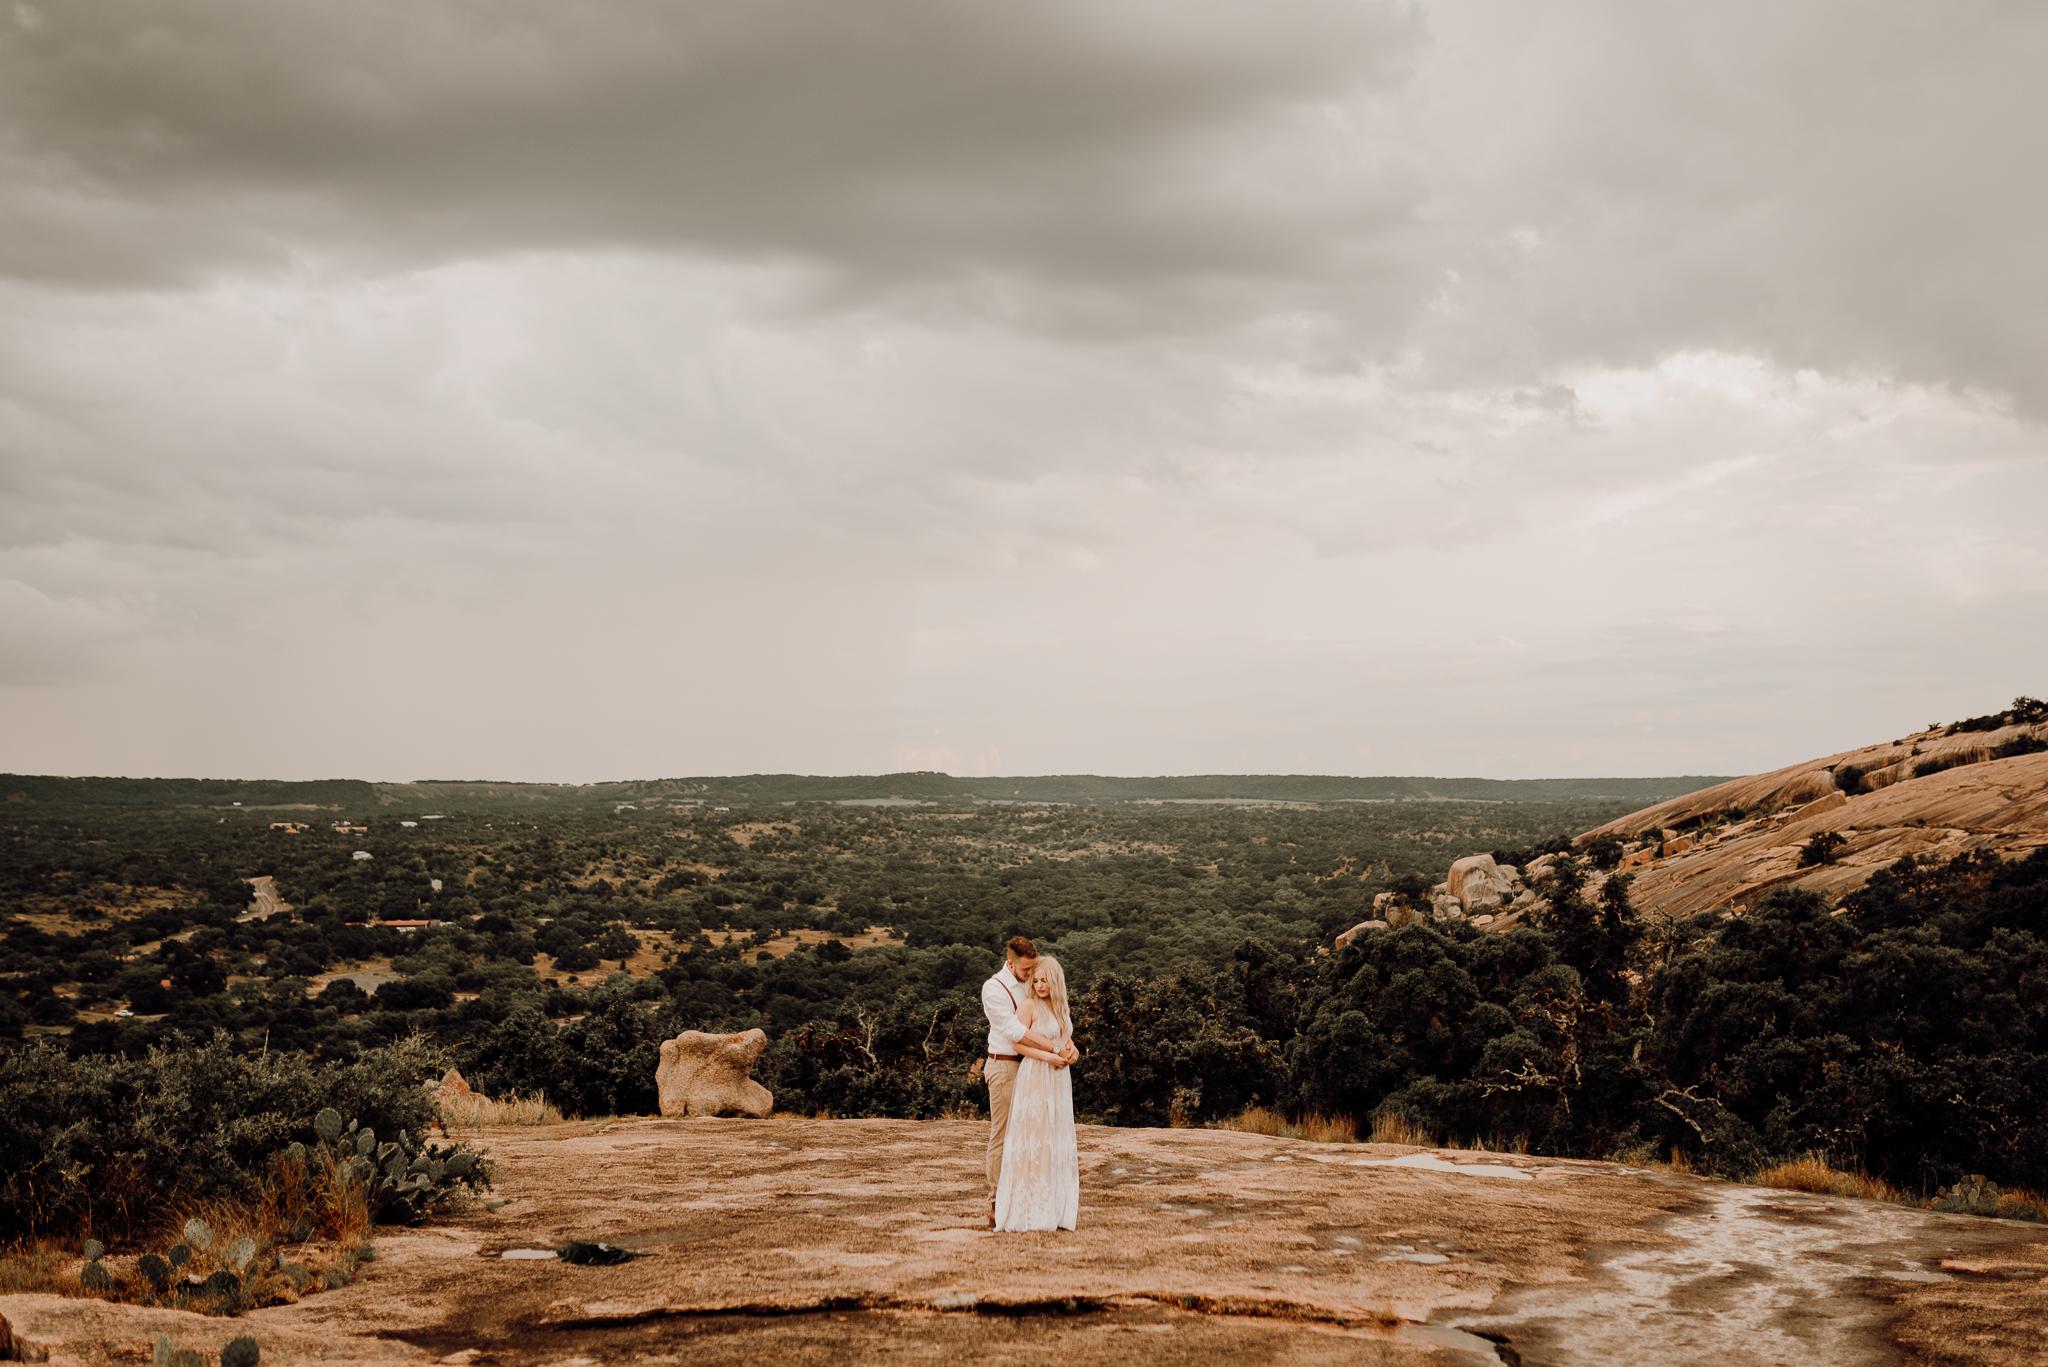 texas-elopement-photographer-enchanted-rock-14-blog.jpg